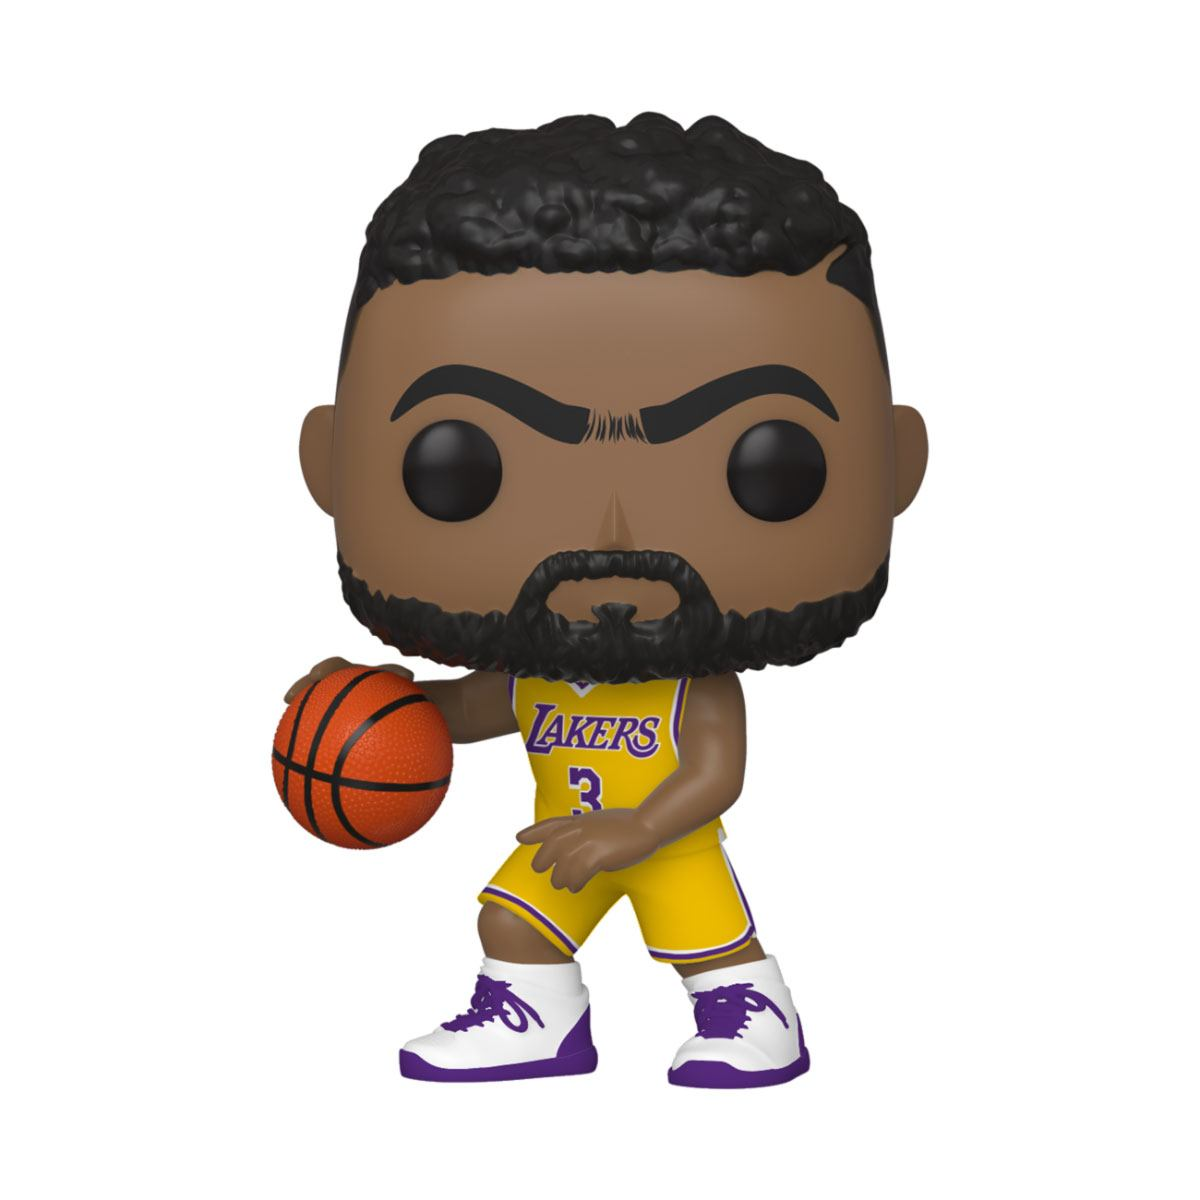 NBA POP! Sports Vinyl Figure Anthony Davis (Lakers) 9 cm